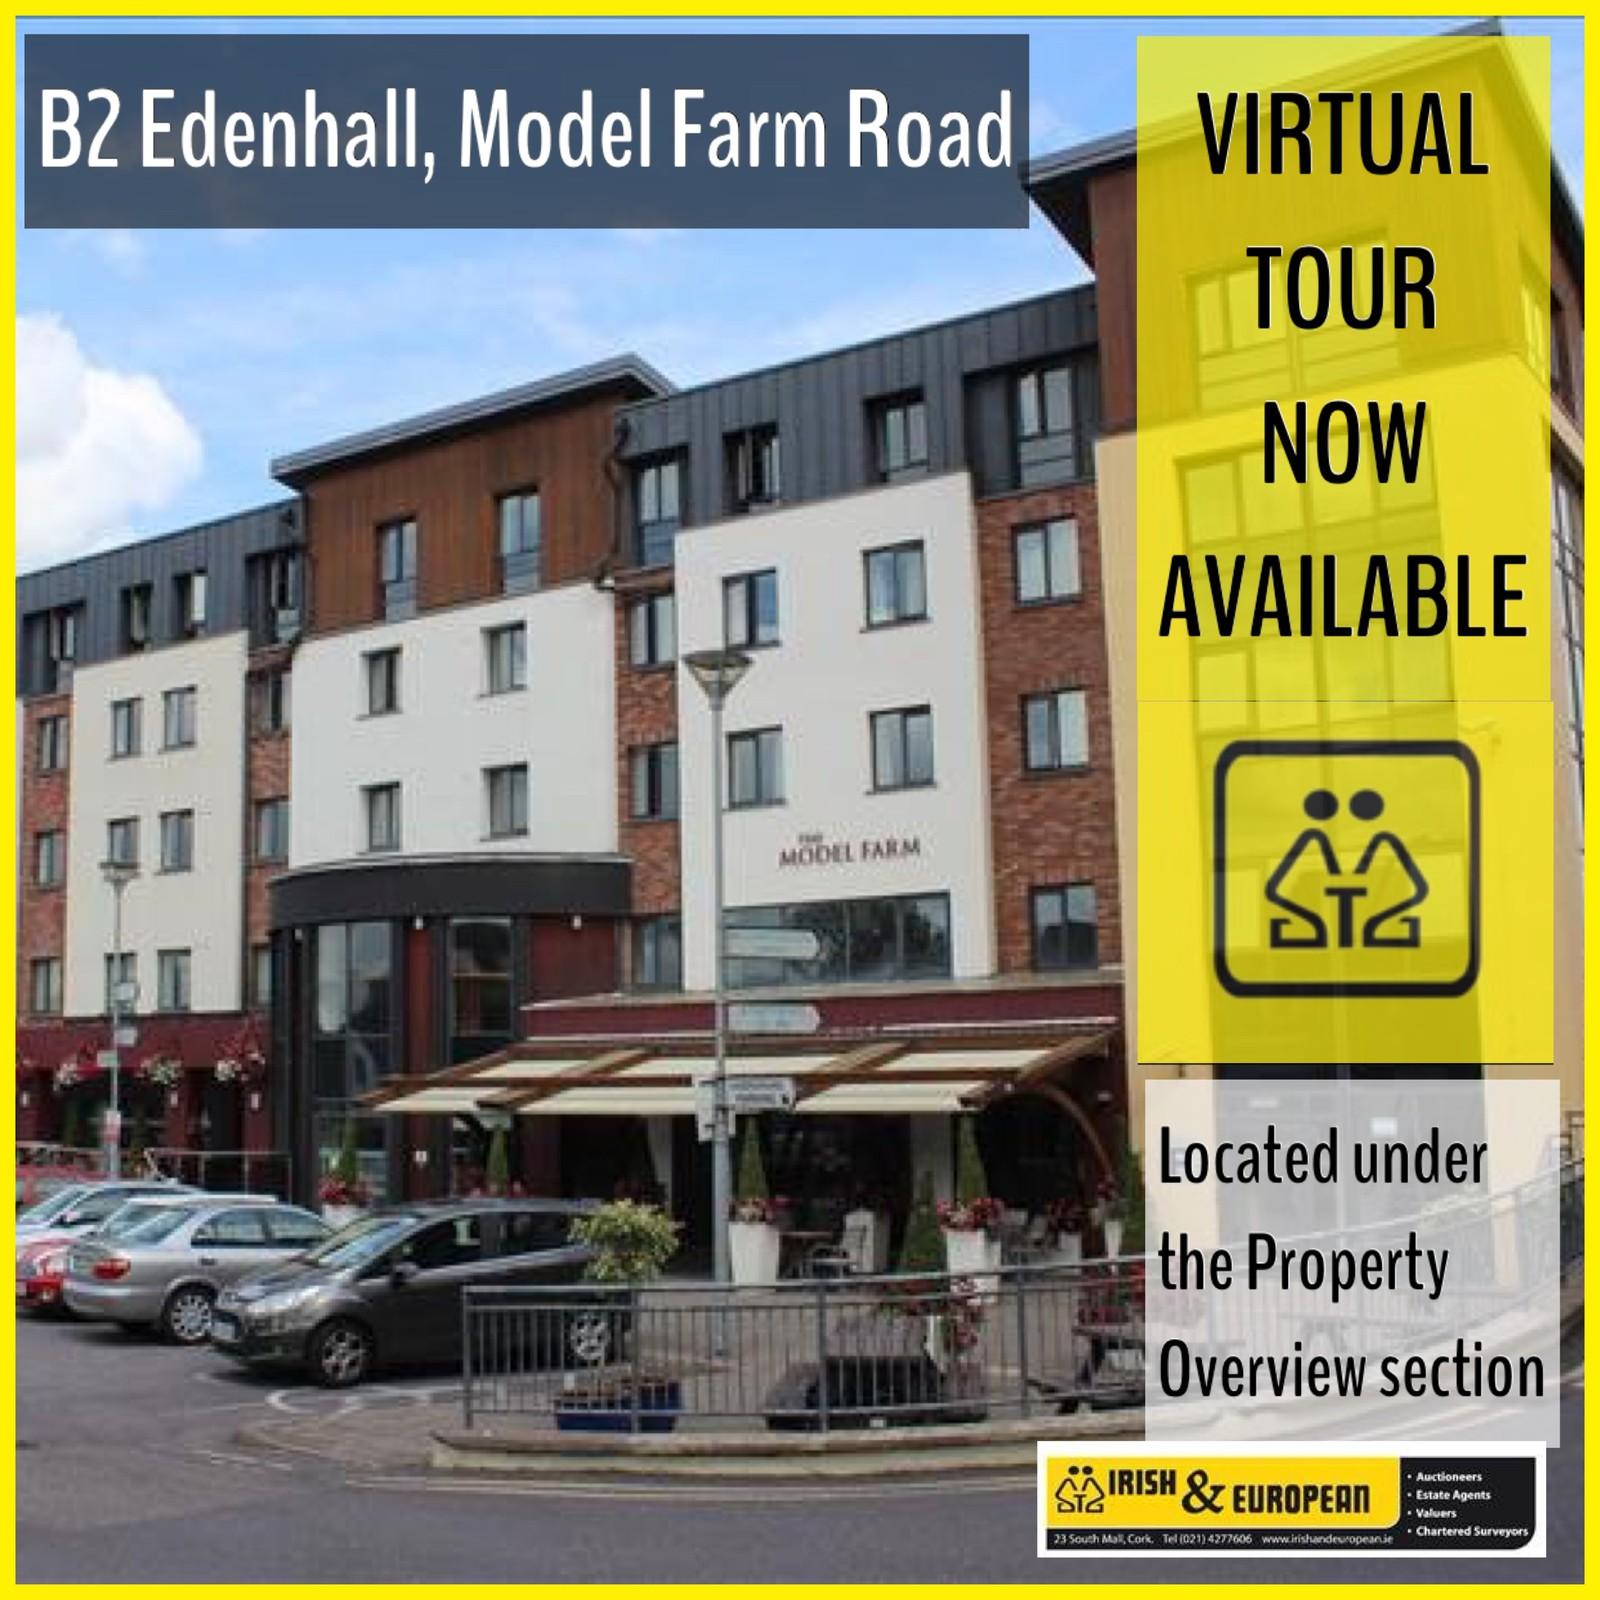 Apartment B2, Edenhall, Model Farm Road, Co. Cork